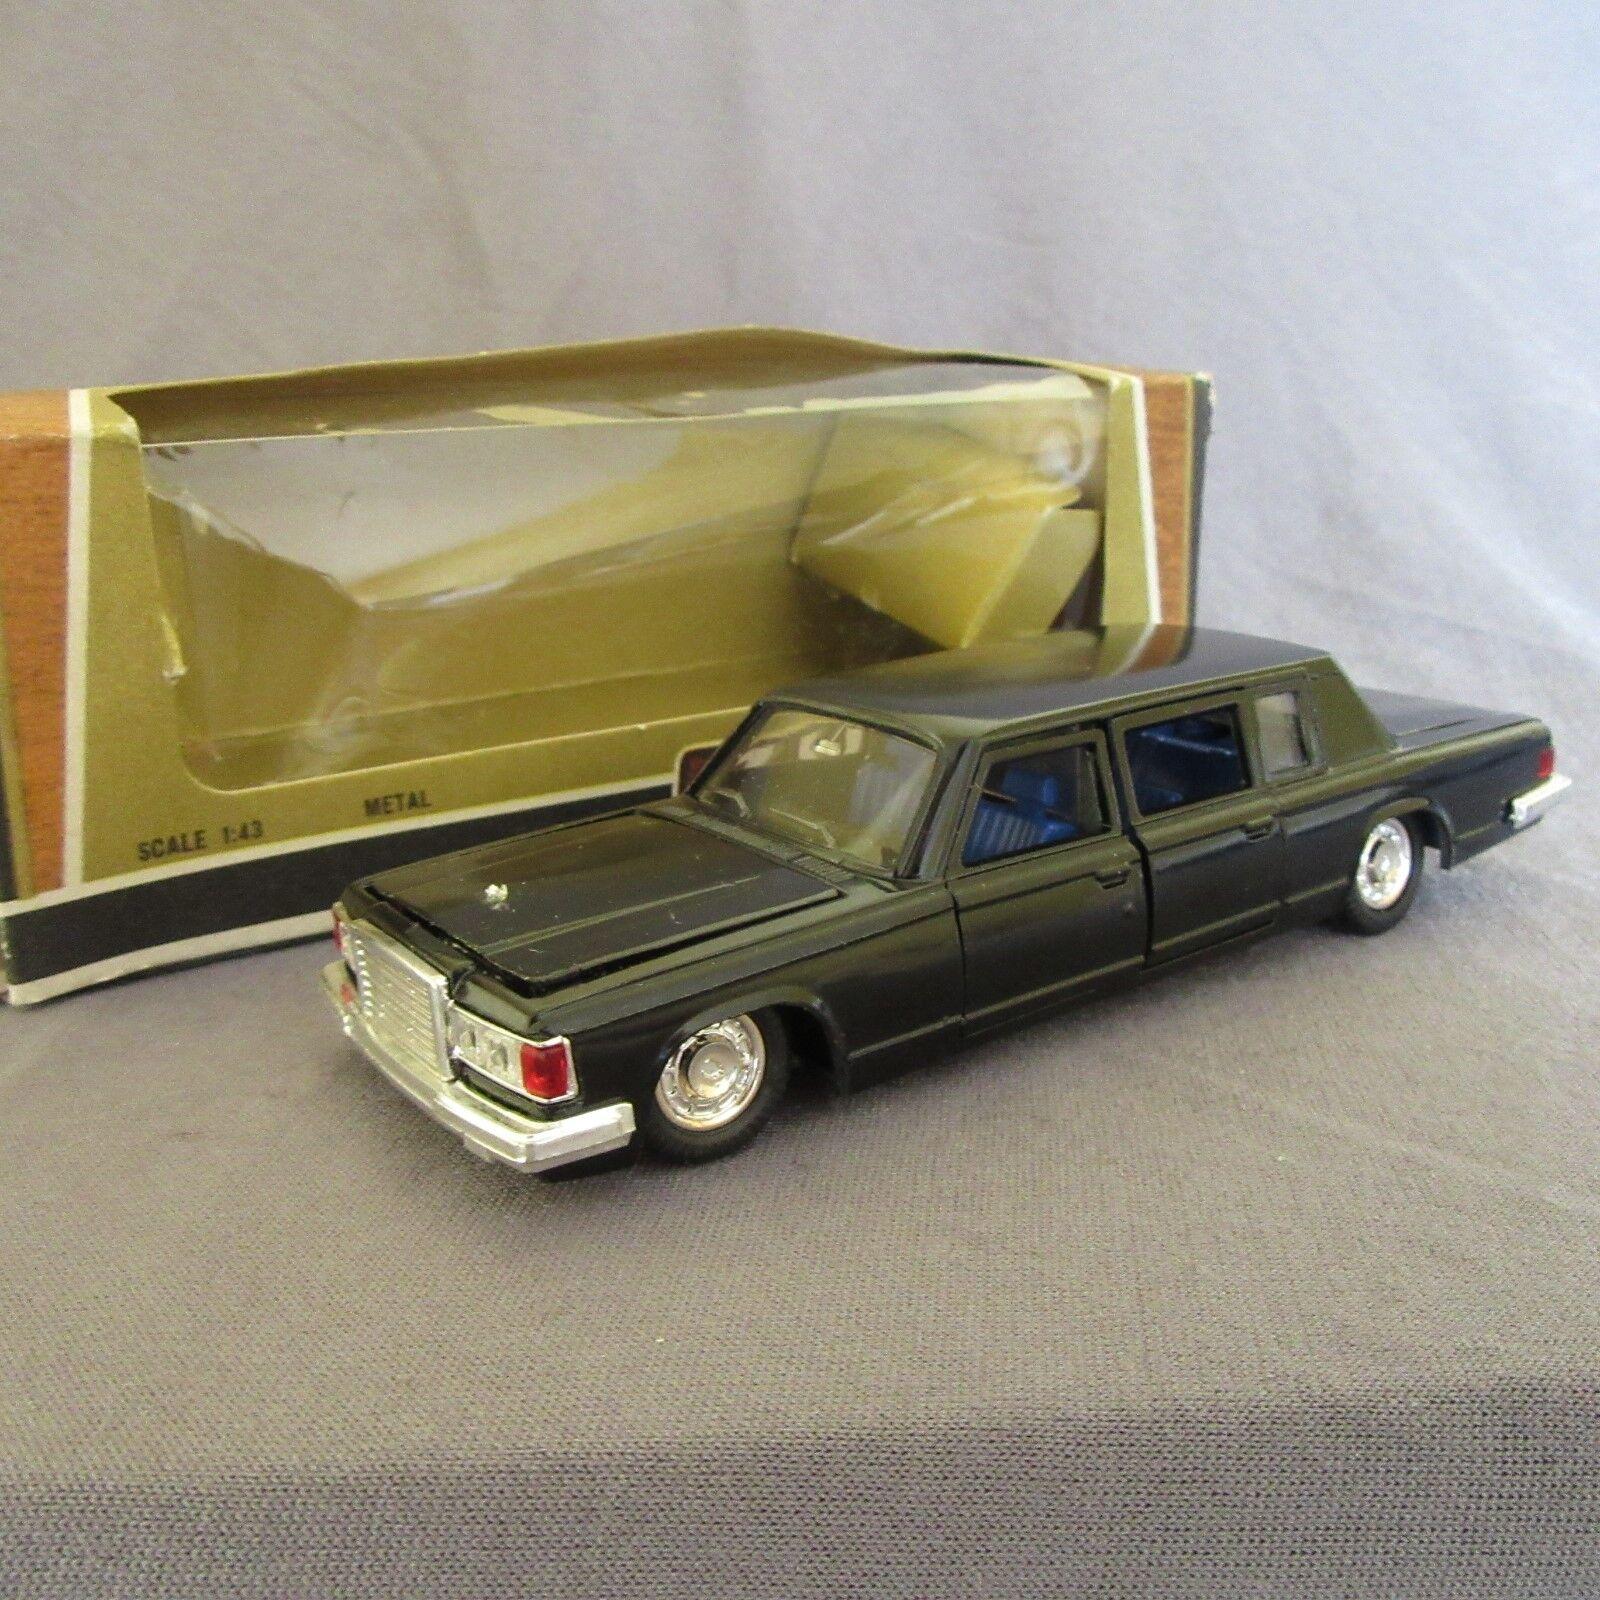 933E Agat Tantal URSS Zil 115 Limousine 1 43 Soviet CCCP